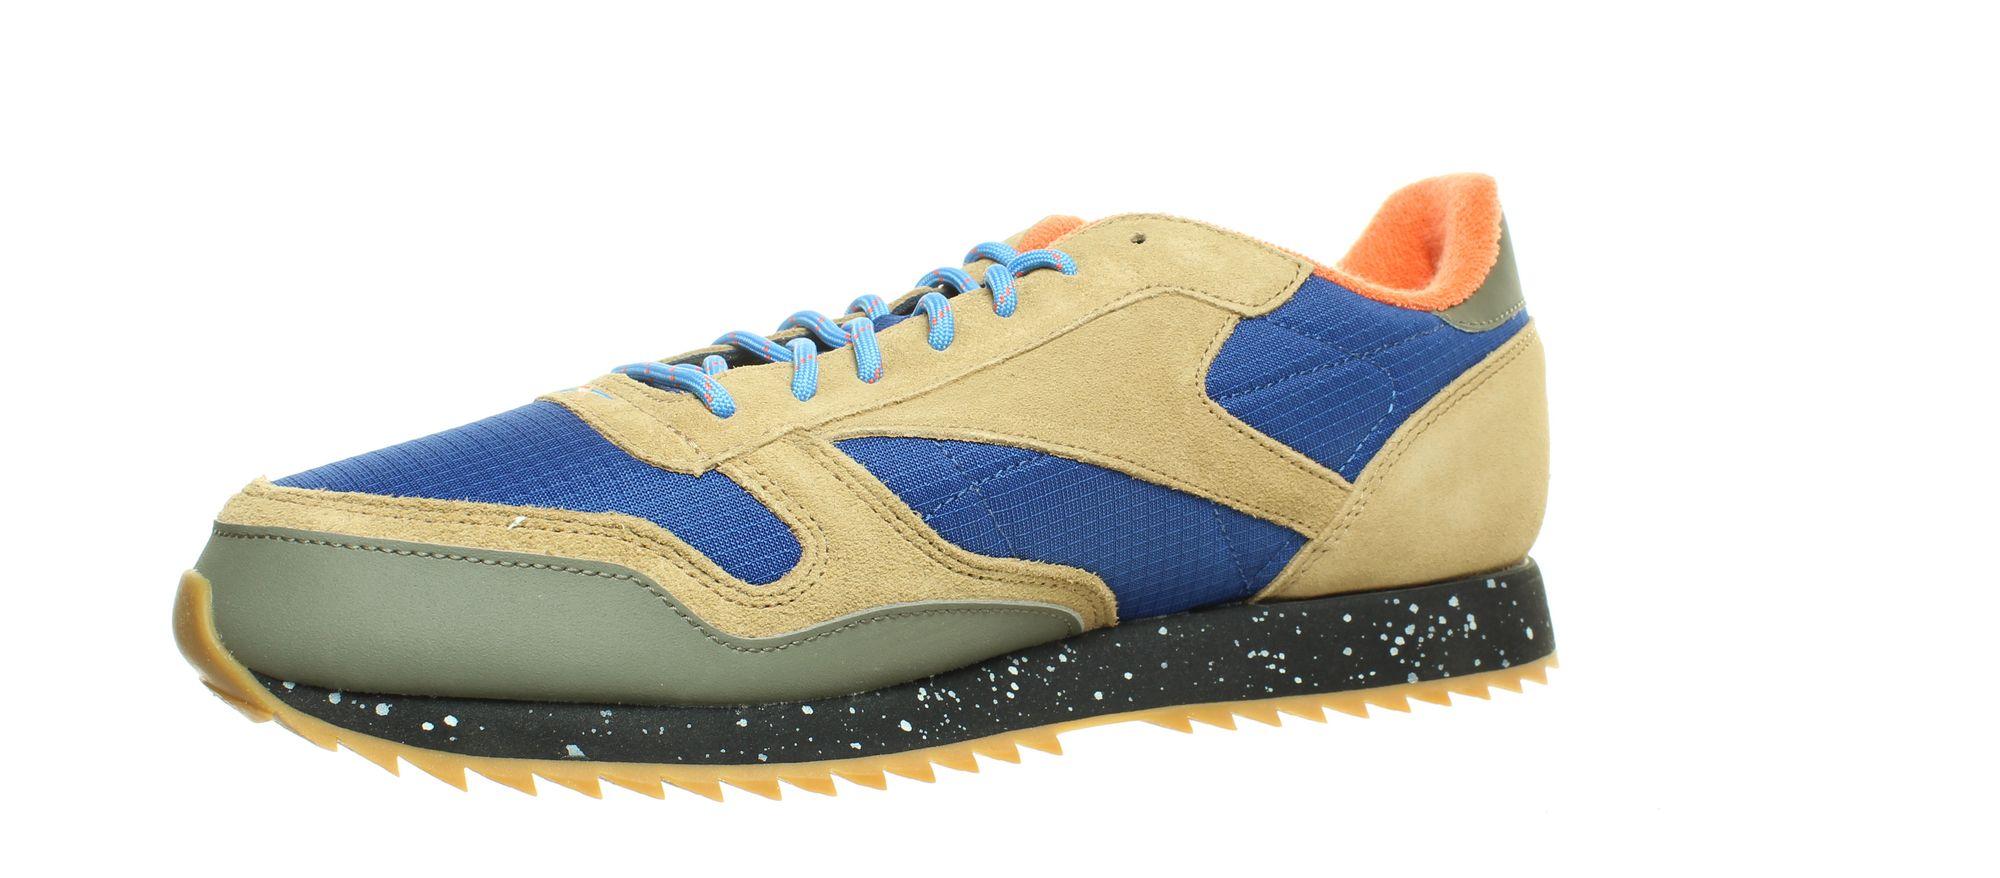 Reebok-Mens-Classic-Leather-Ripple-Fashion-Sneakers thumbnail 7